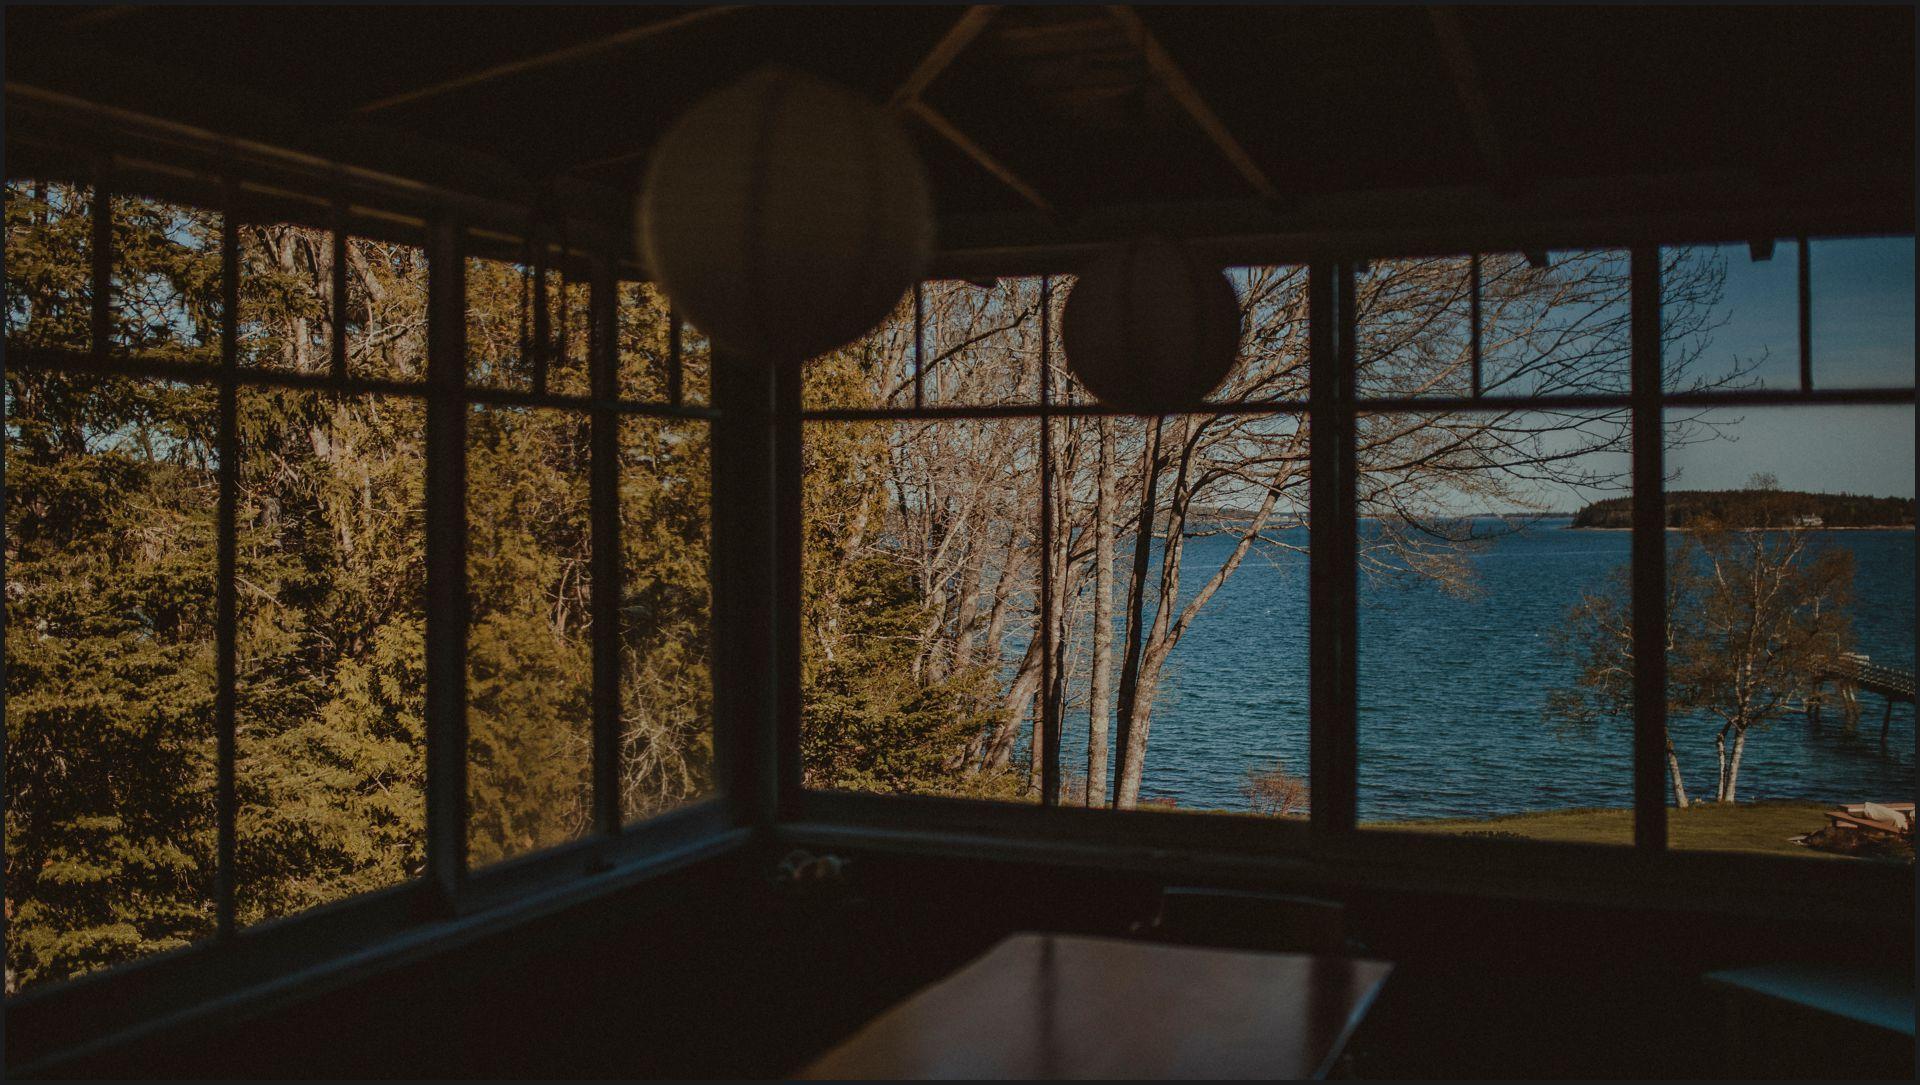 wedding venue, ocean view, cottage, acadia national park, southwest harbor